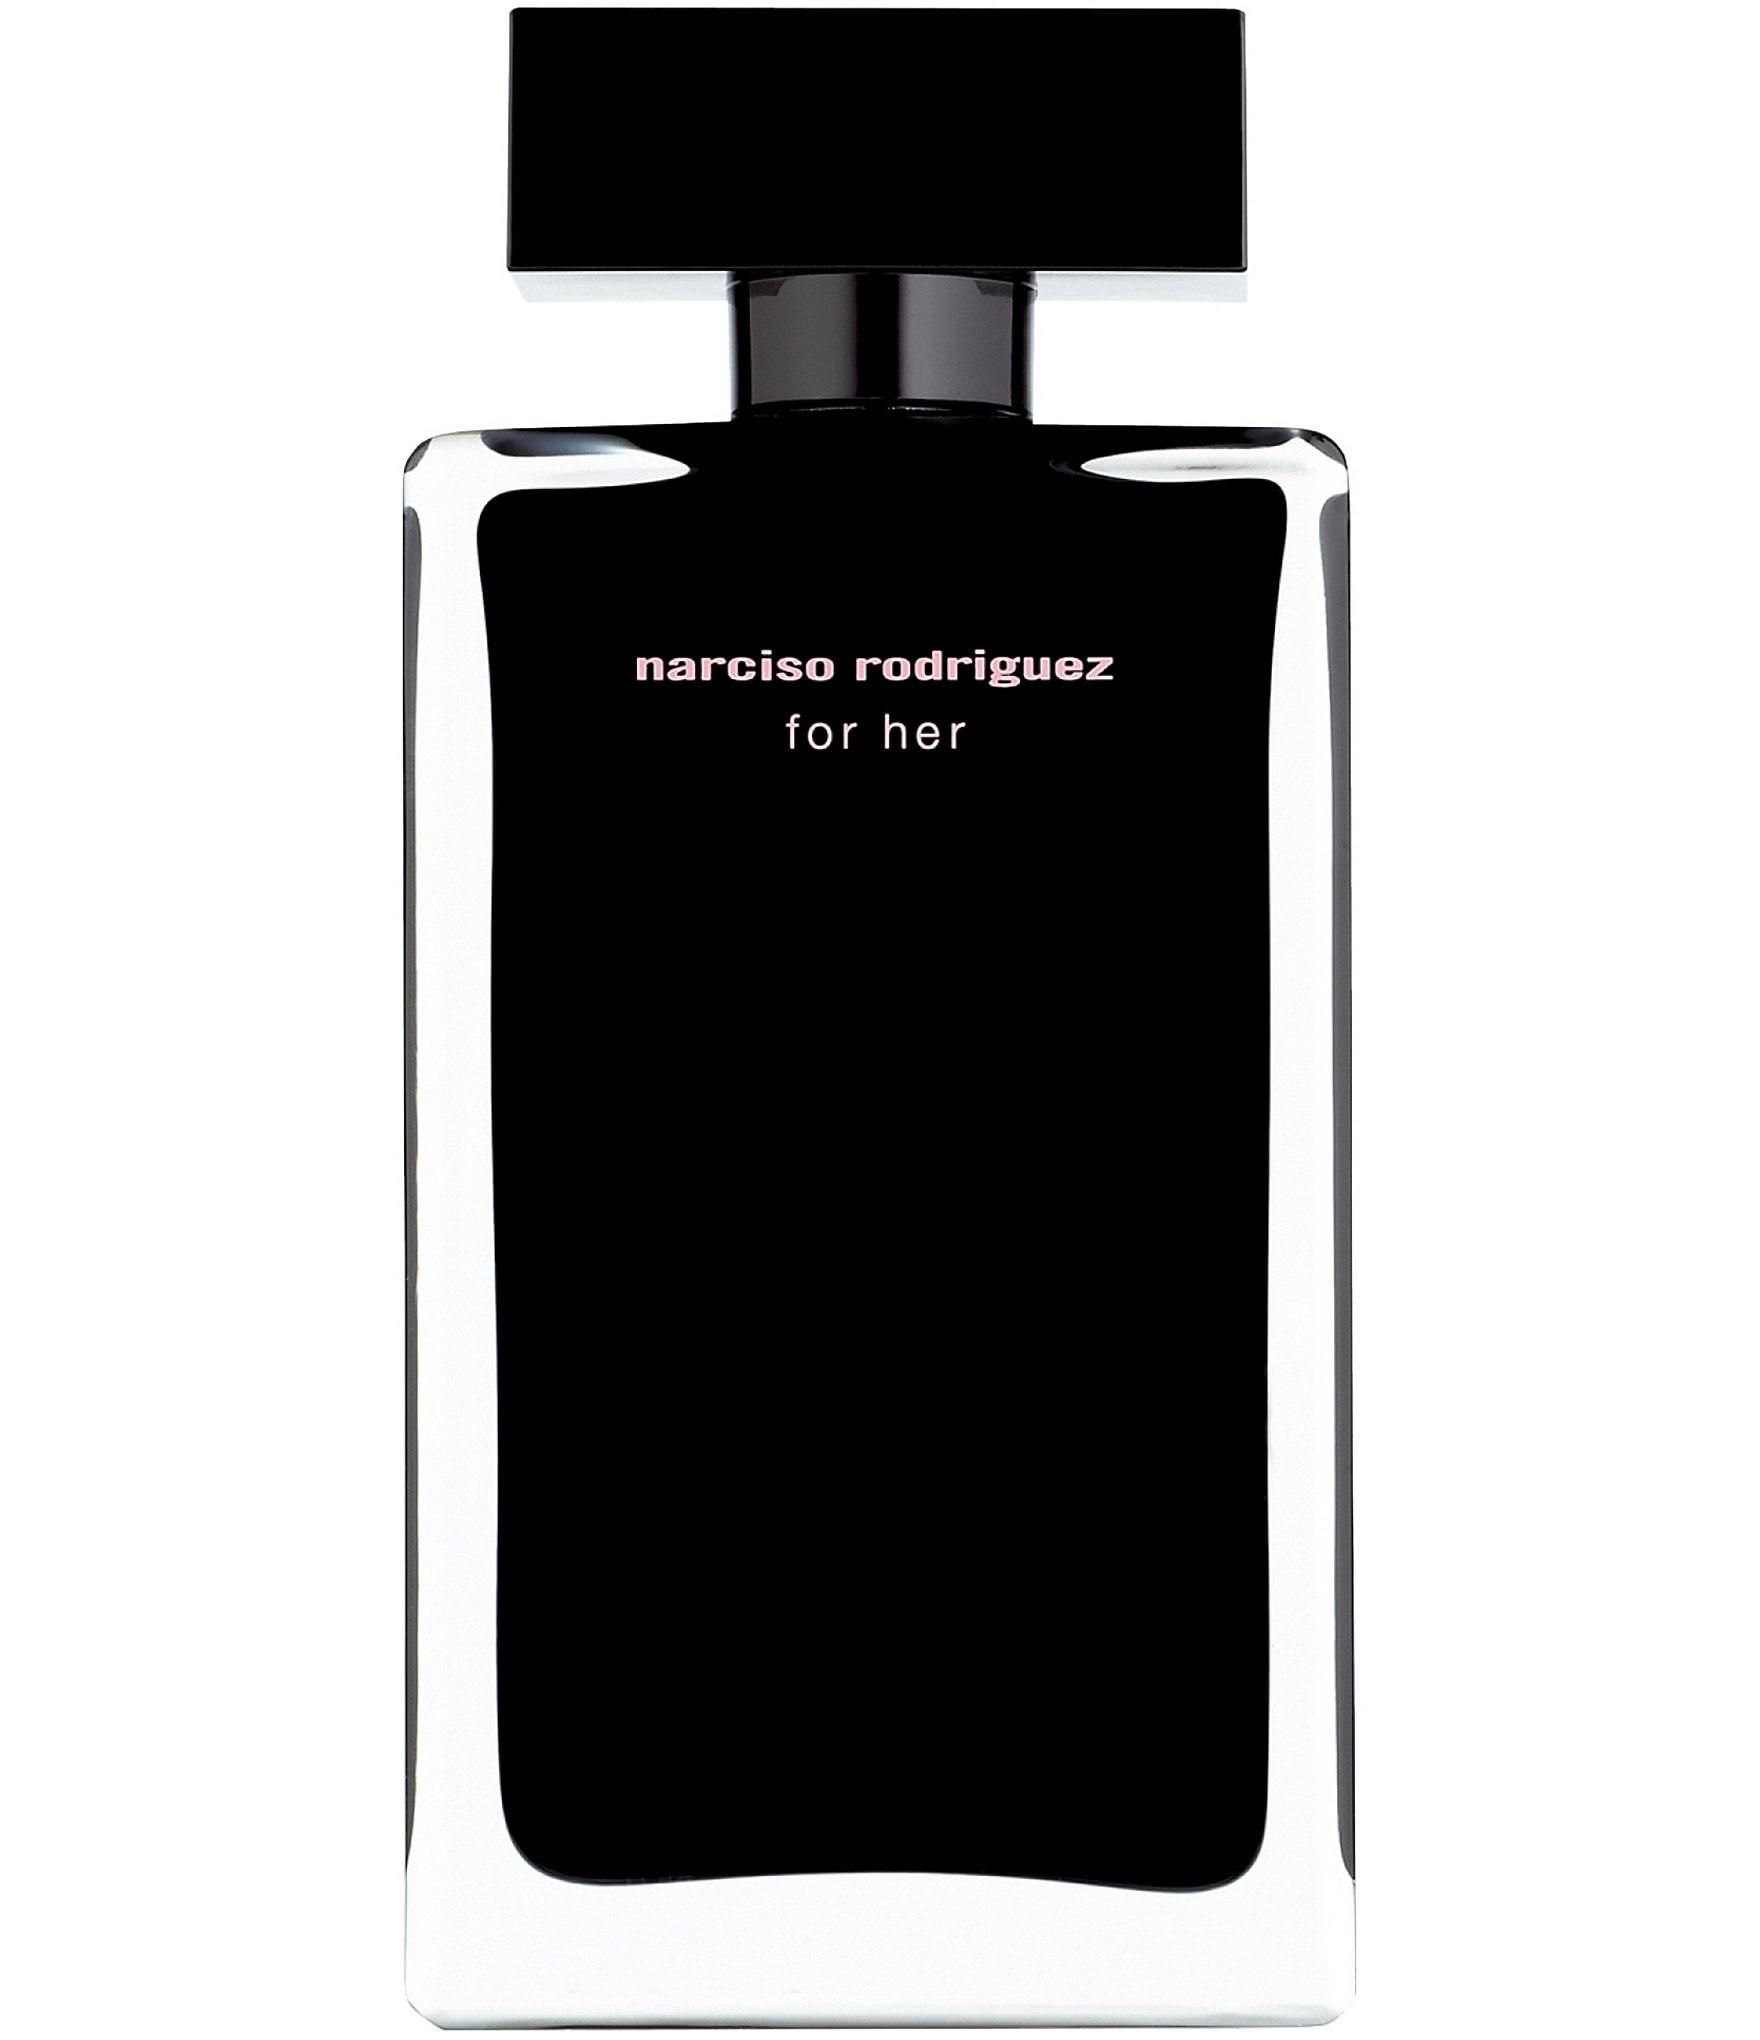 narciso rodriguez for her eau de toilette spray dillard 39 s. Black Bedroom Furniture Sets. Home Design Ideas